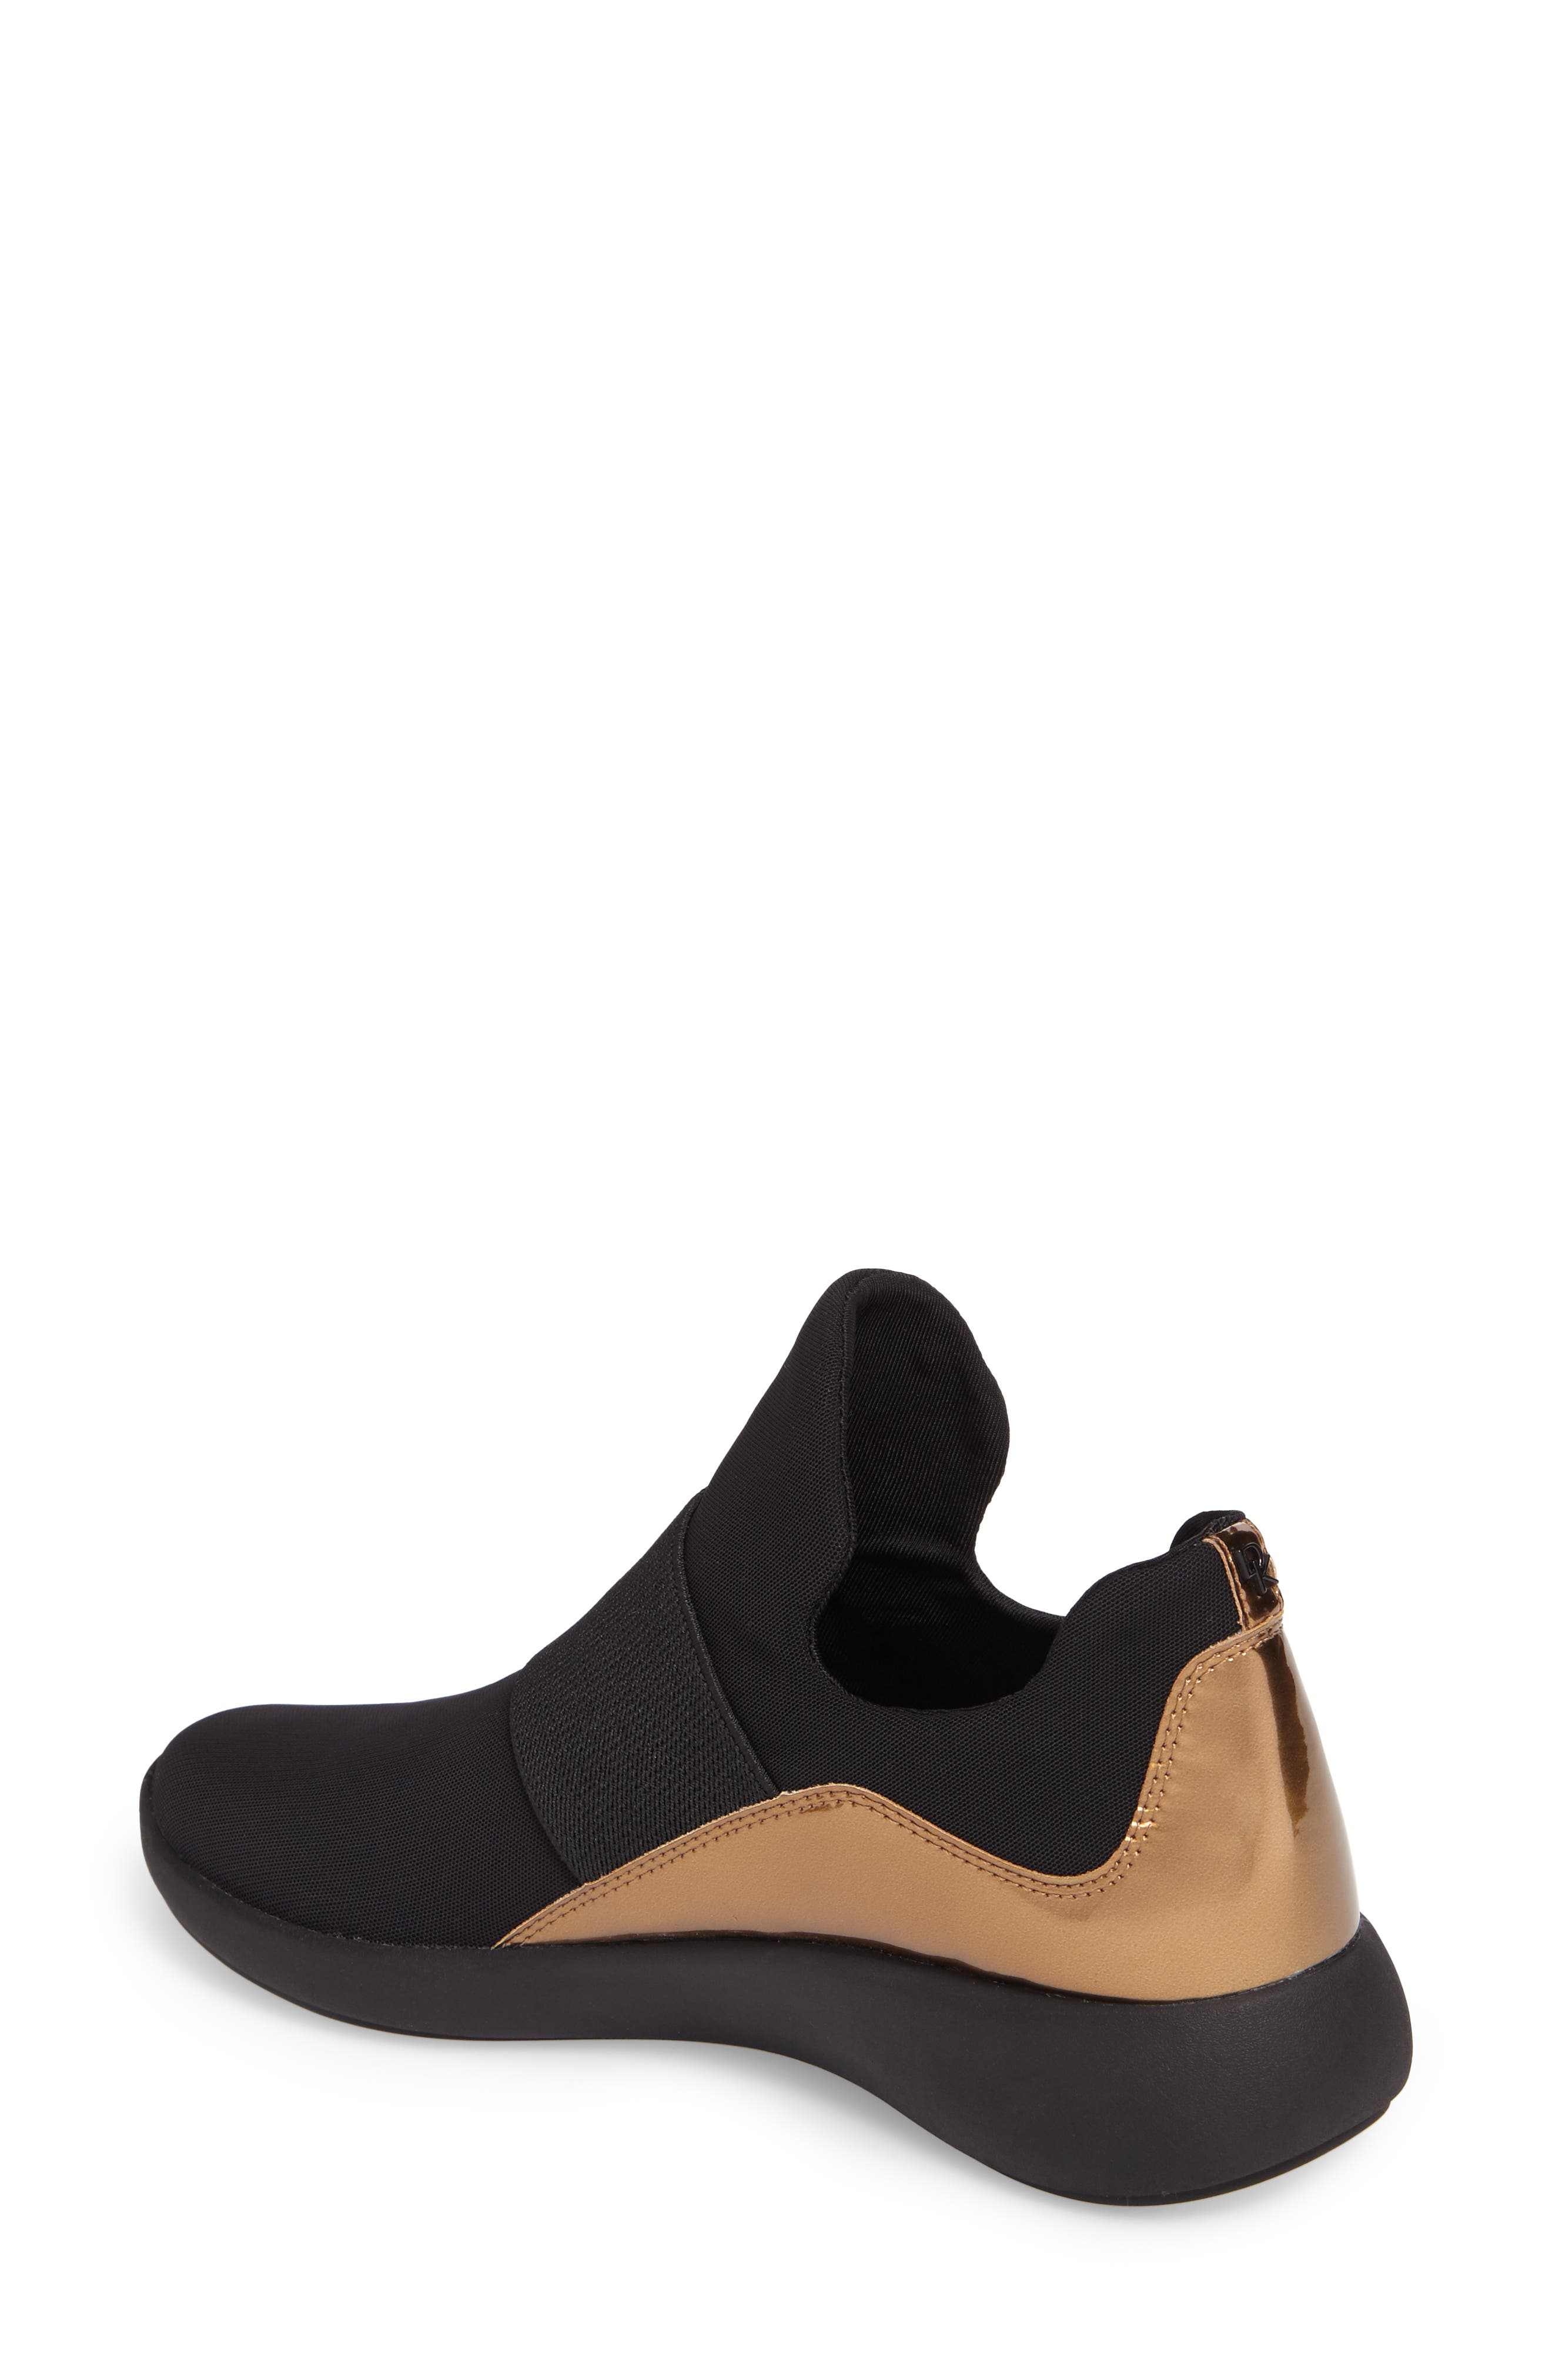 Alternate Image 2  - Donna Karan Cory Slip-On Sneaker (Women)